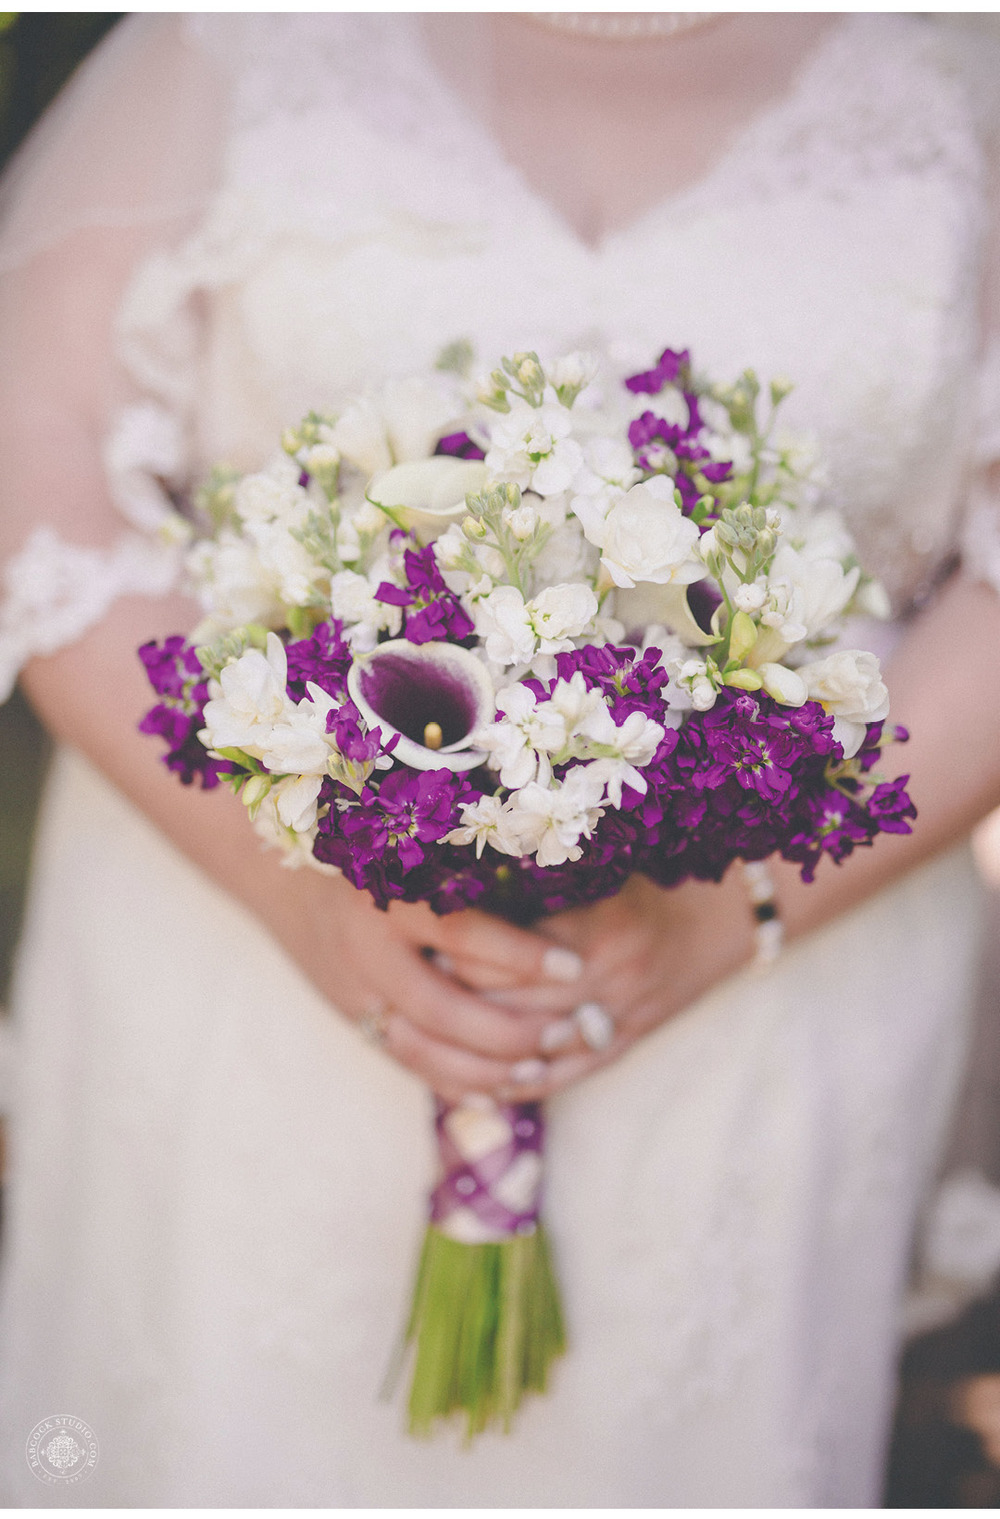 megan-nate-wedding-photographer-dayton-ohio-5.jpg